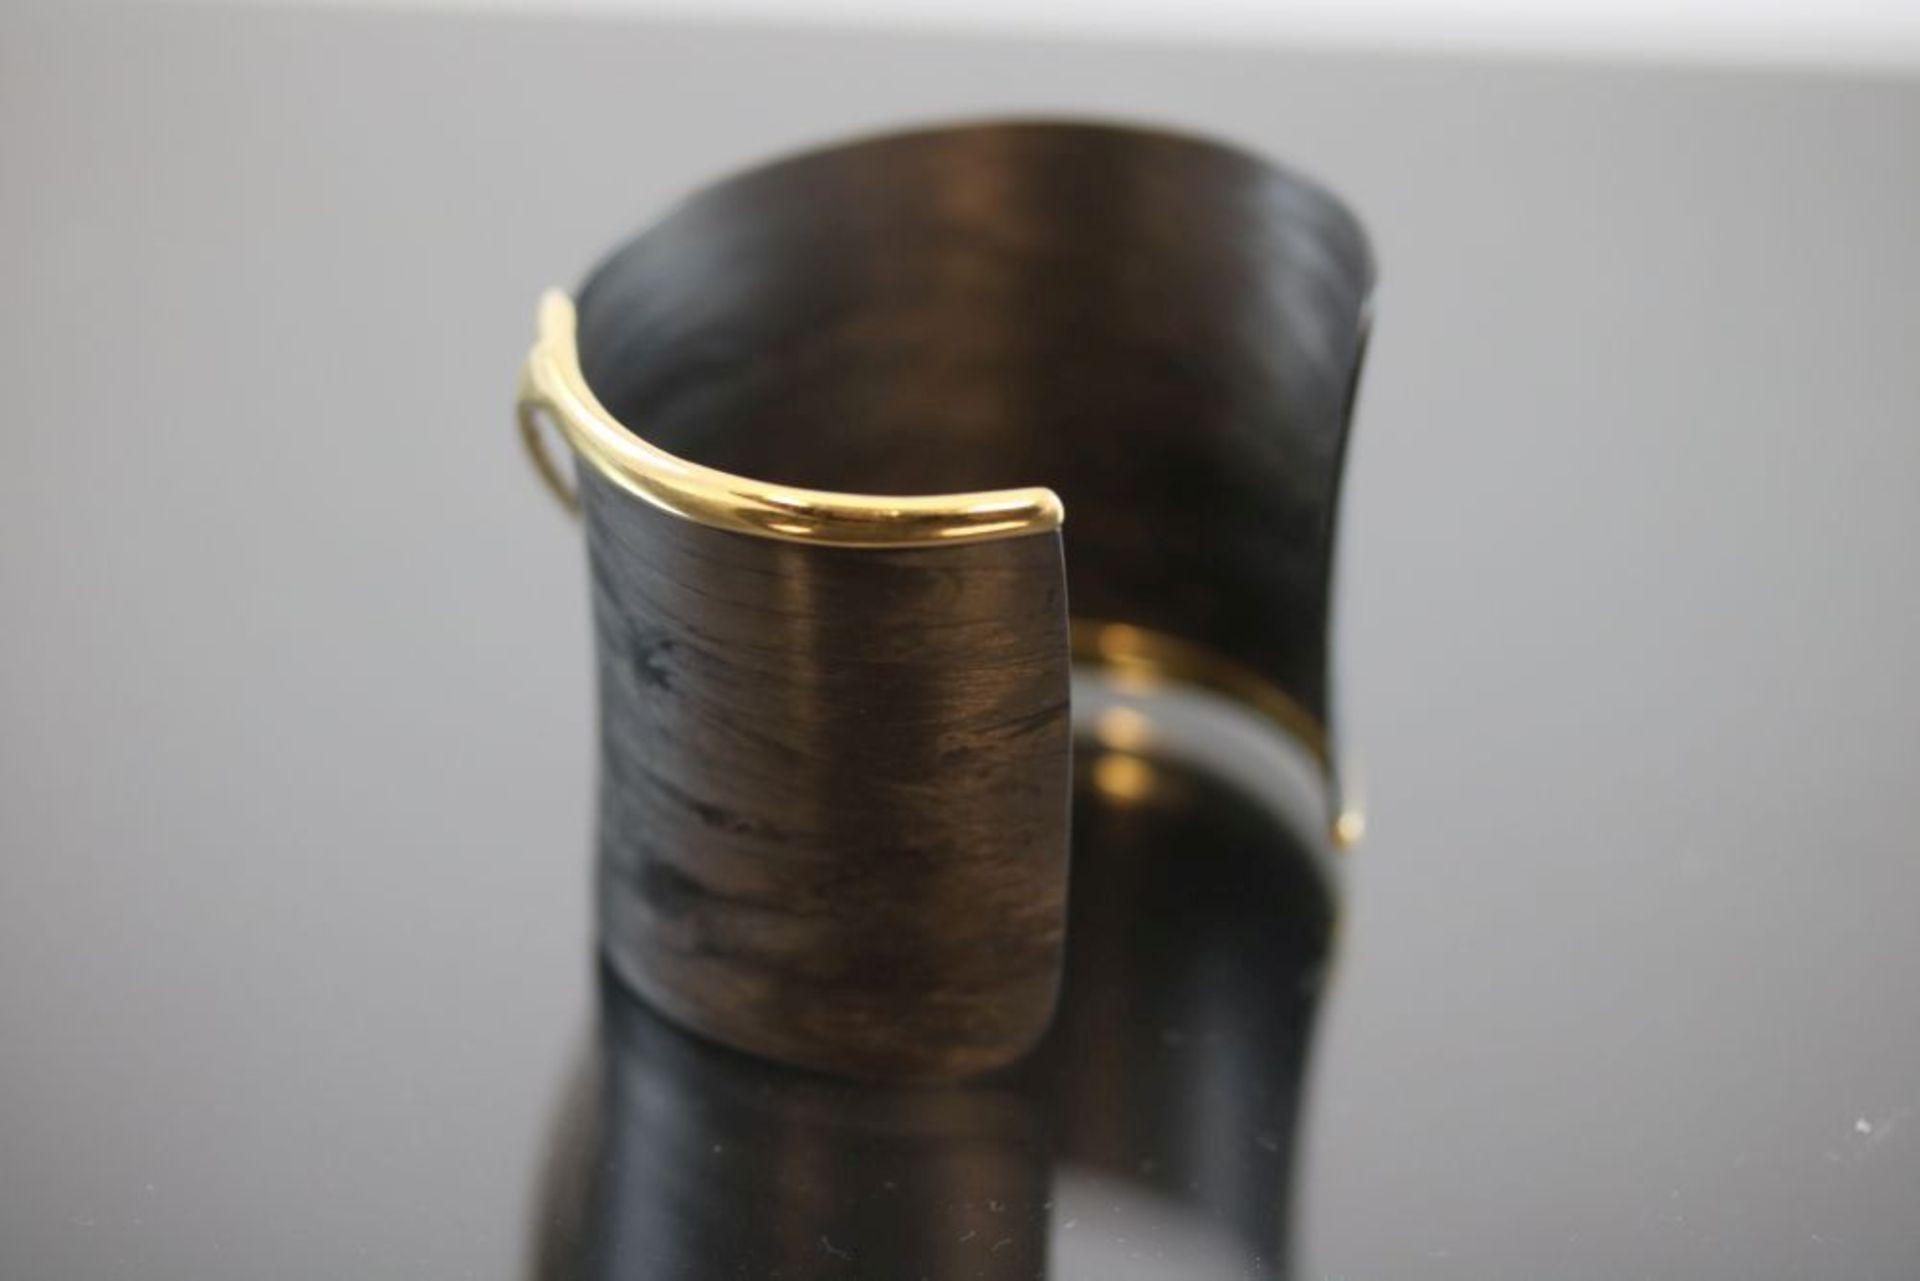 Armreif, Carbon/ Metall vergoldet 17,3 - Image 2 of 3